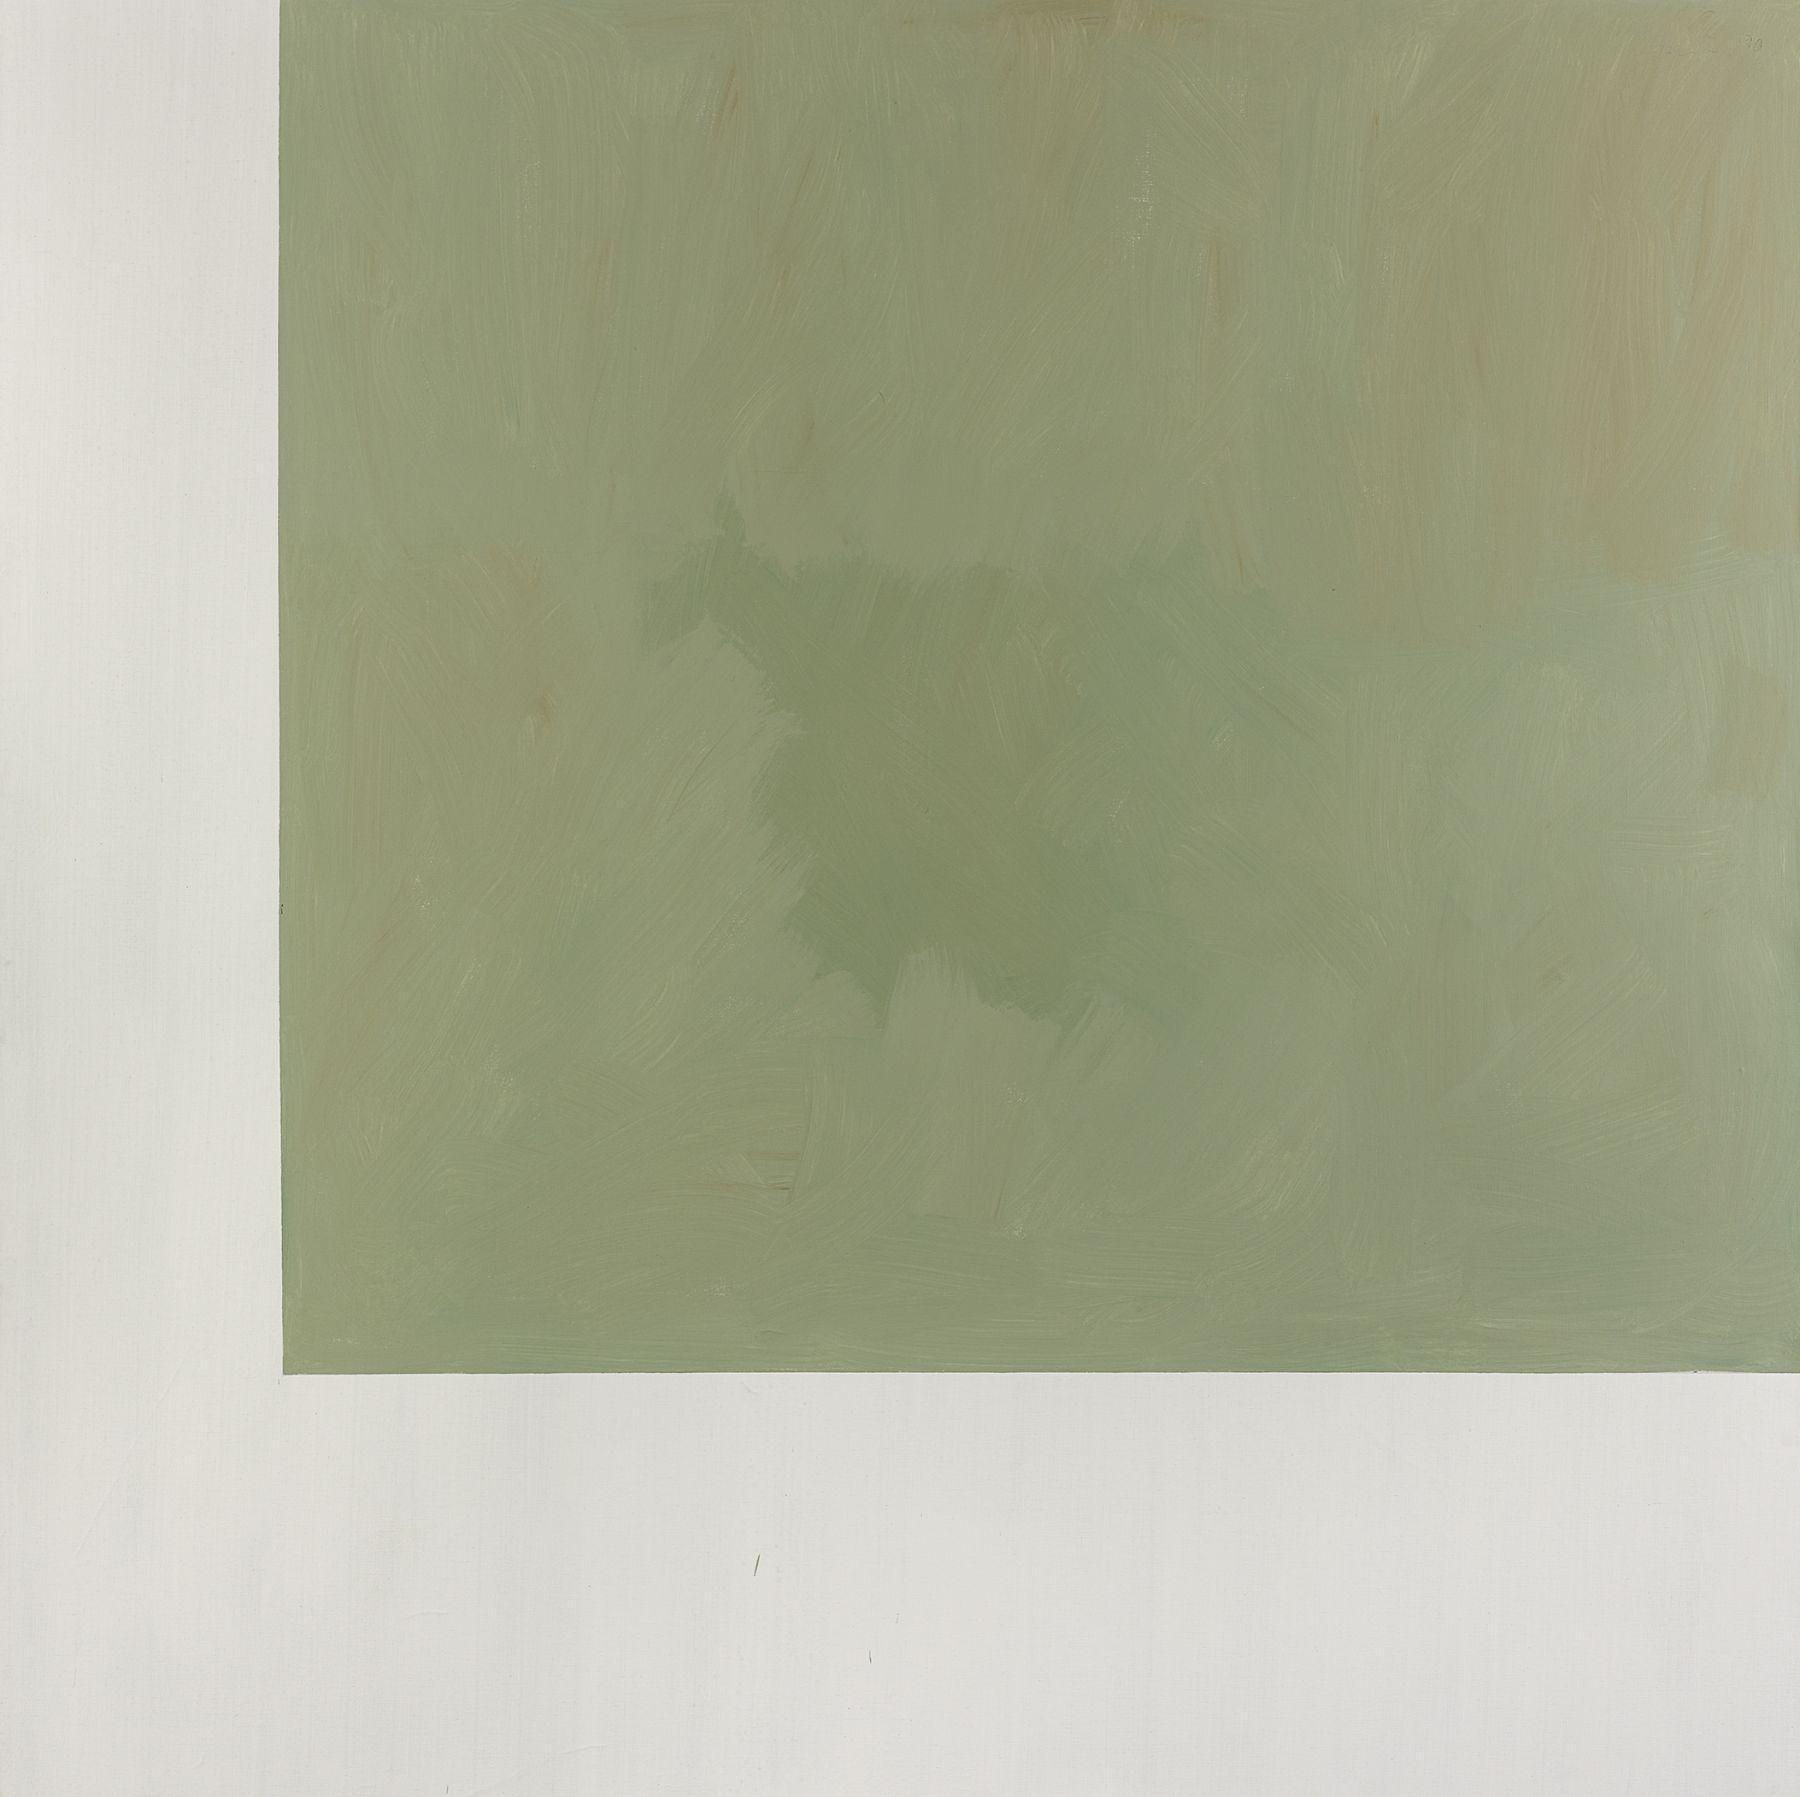 Günther Förg Untitled, 1991 Acrylic on canvas Ten pieces: 114 1/8 x 114 1/8 inches (290 x 290 cm) each (